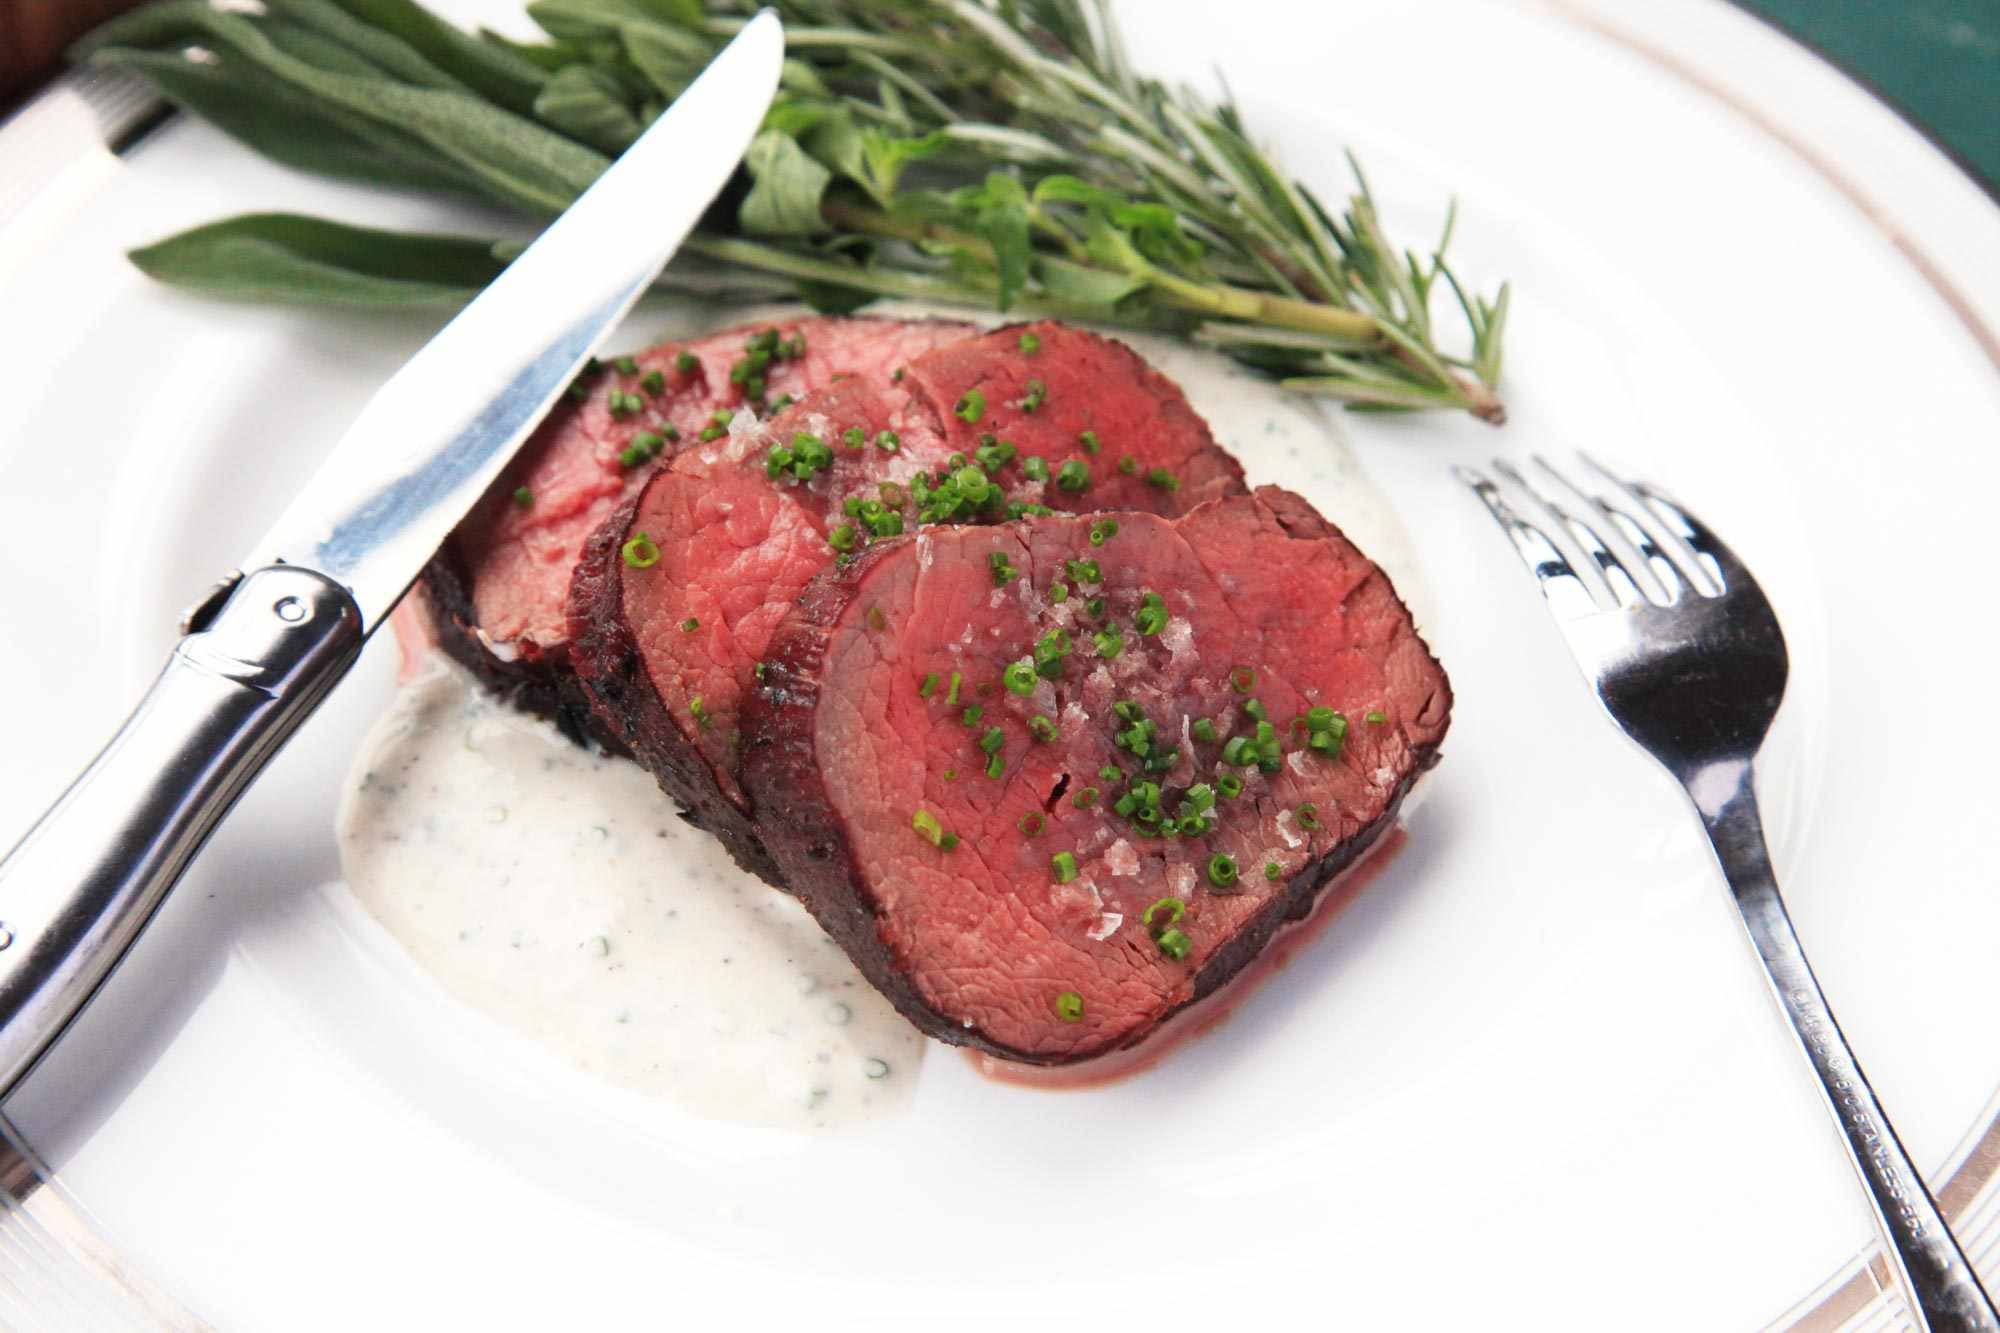 20141217-tenderloin-roast-recipe-food-lab-24.jpg